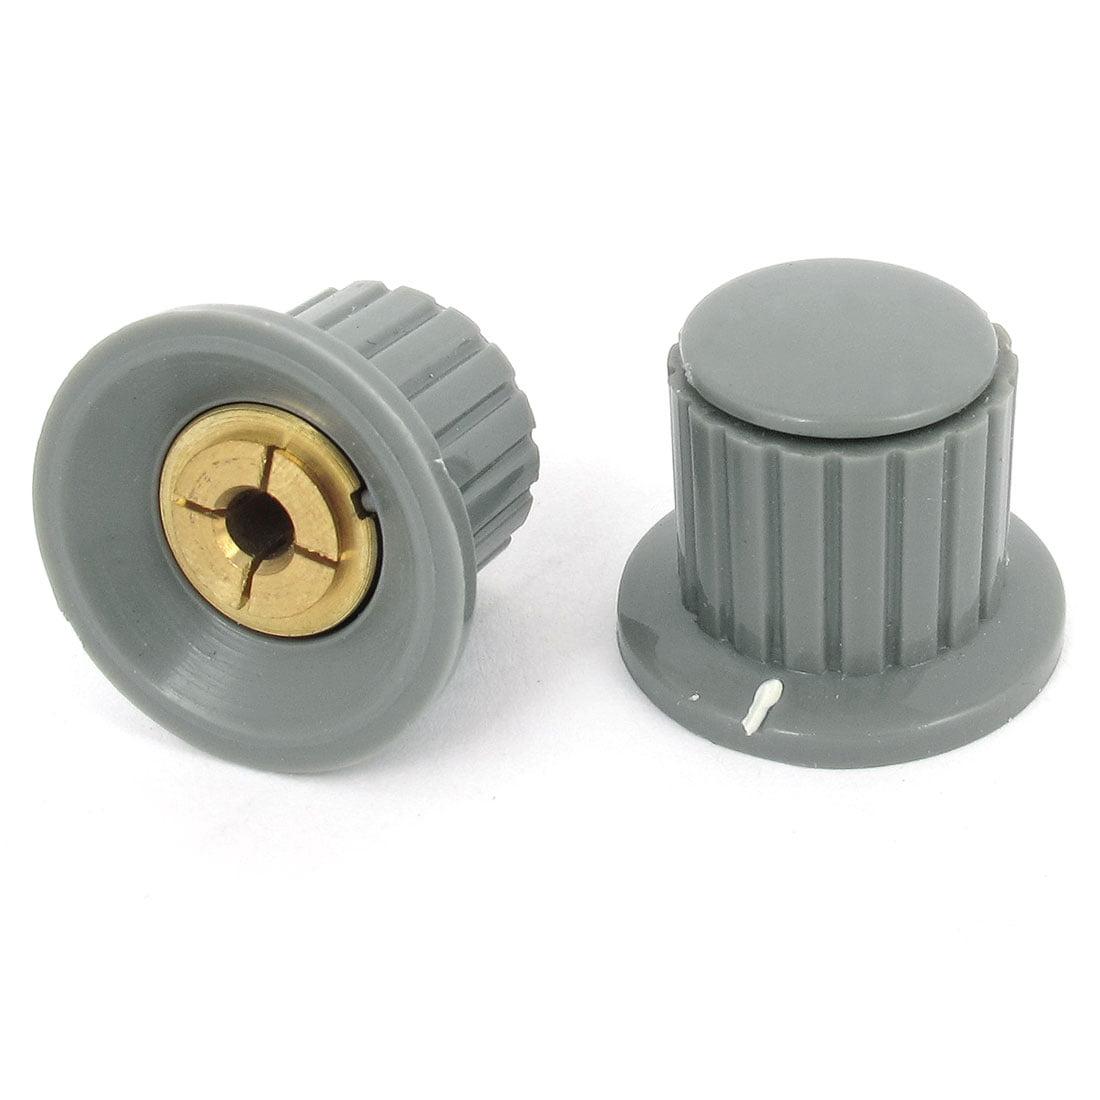 2 pcs volume control 4mm split shaft dia potentiometer mixer knobs gray. Black Bedroom Furniture Sets. Home Design Ideas